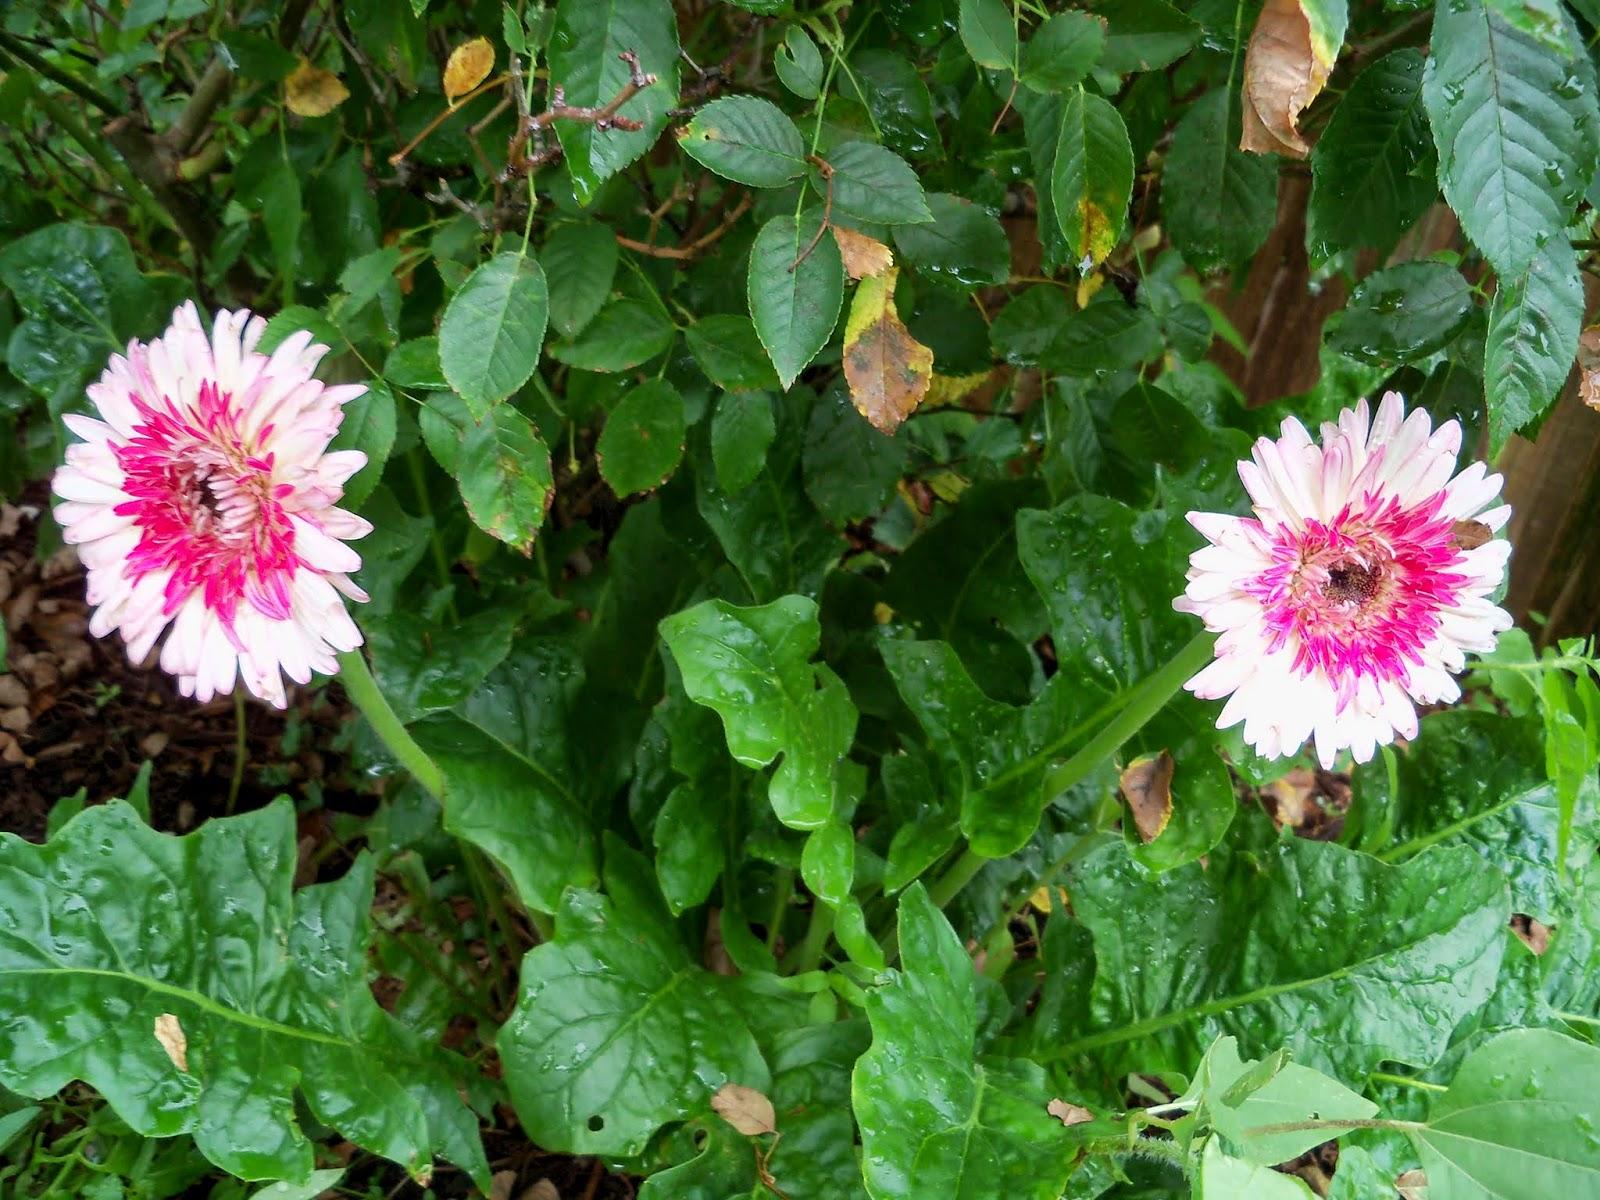 Gardening 2014 - 116_2605.JPG